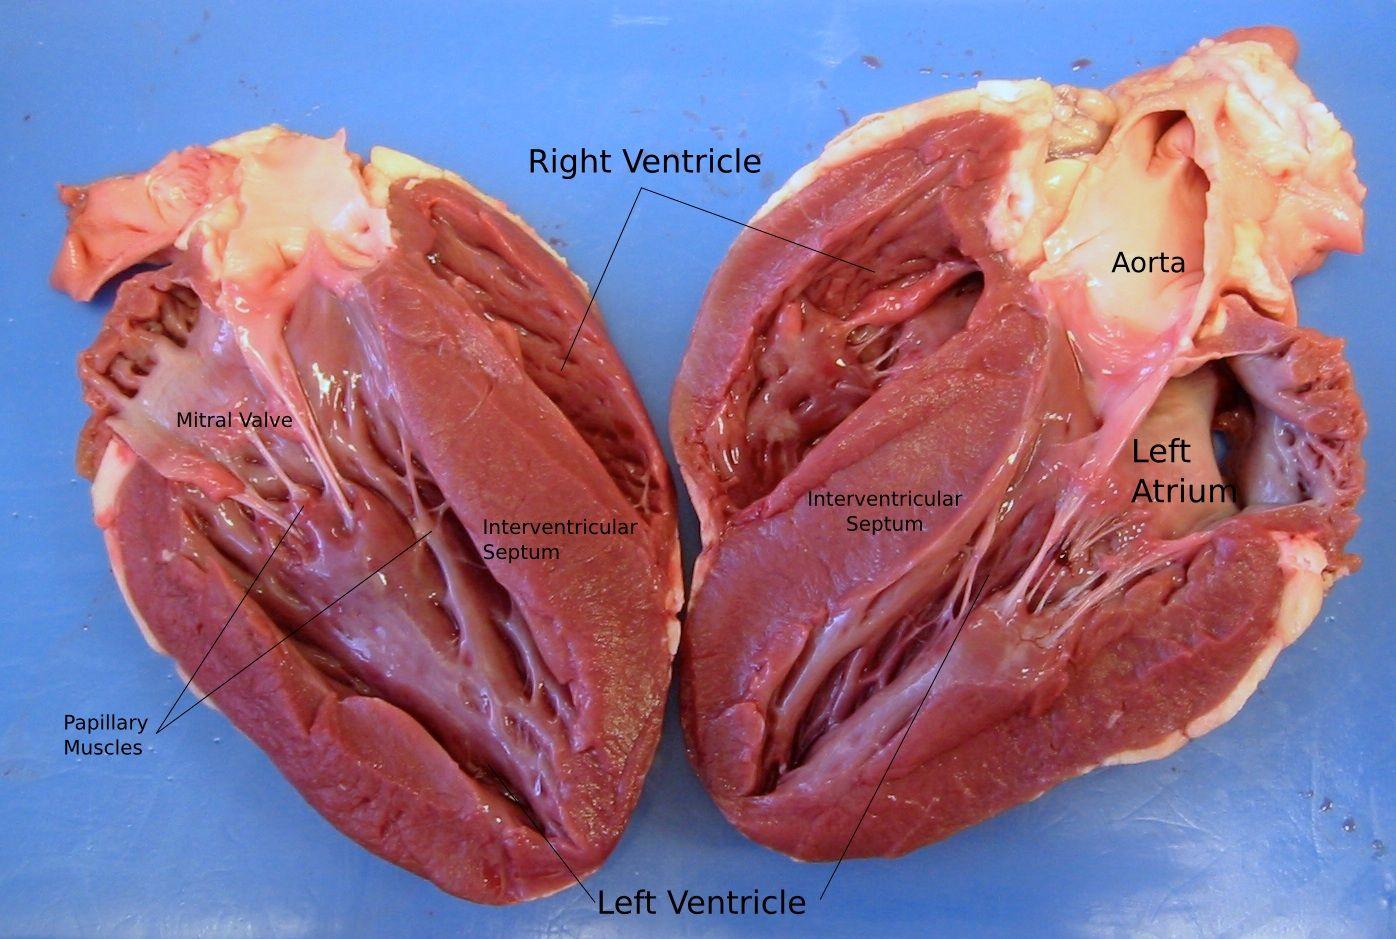 Anatomy Of Heart Real Gallery Human Learni On Photo Subject